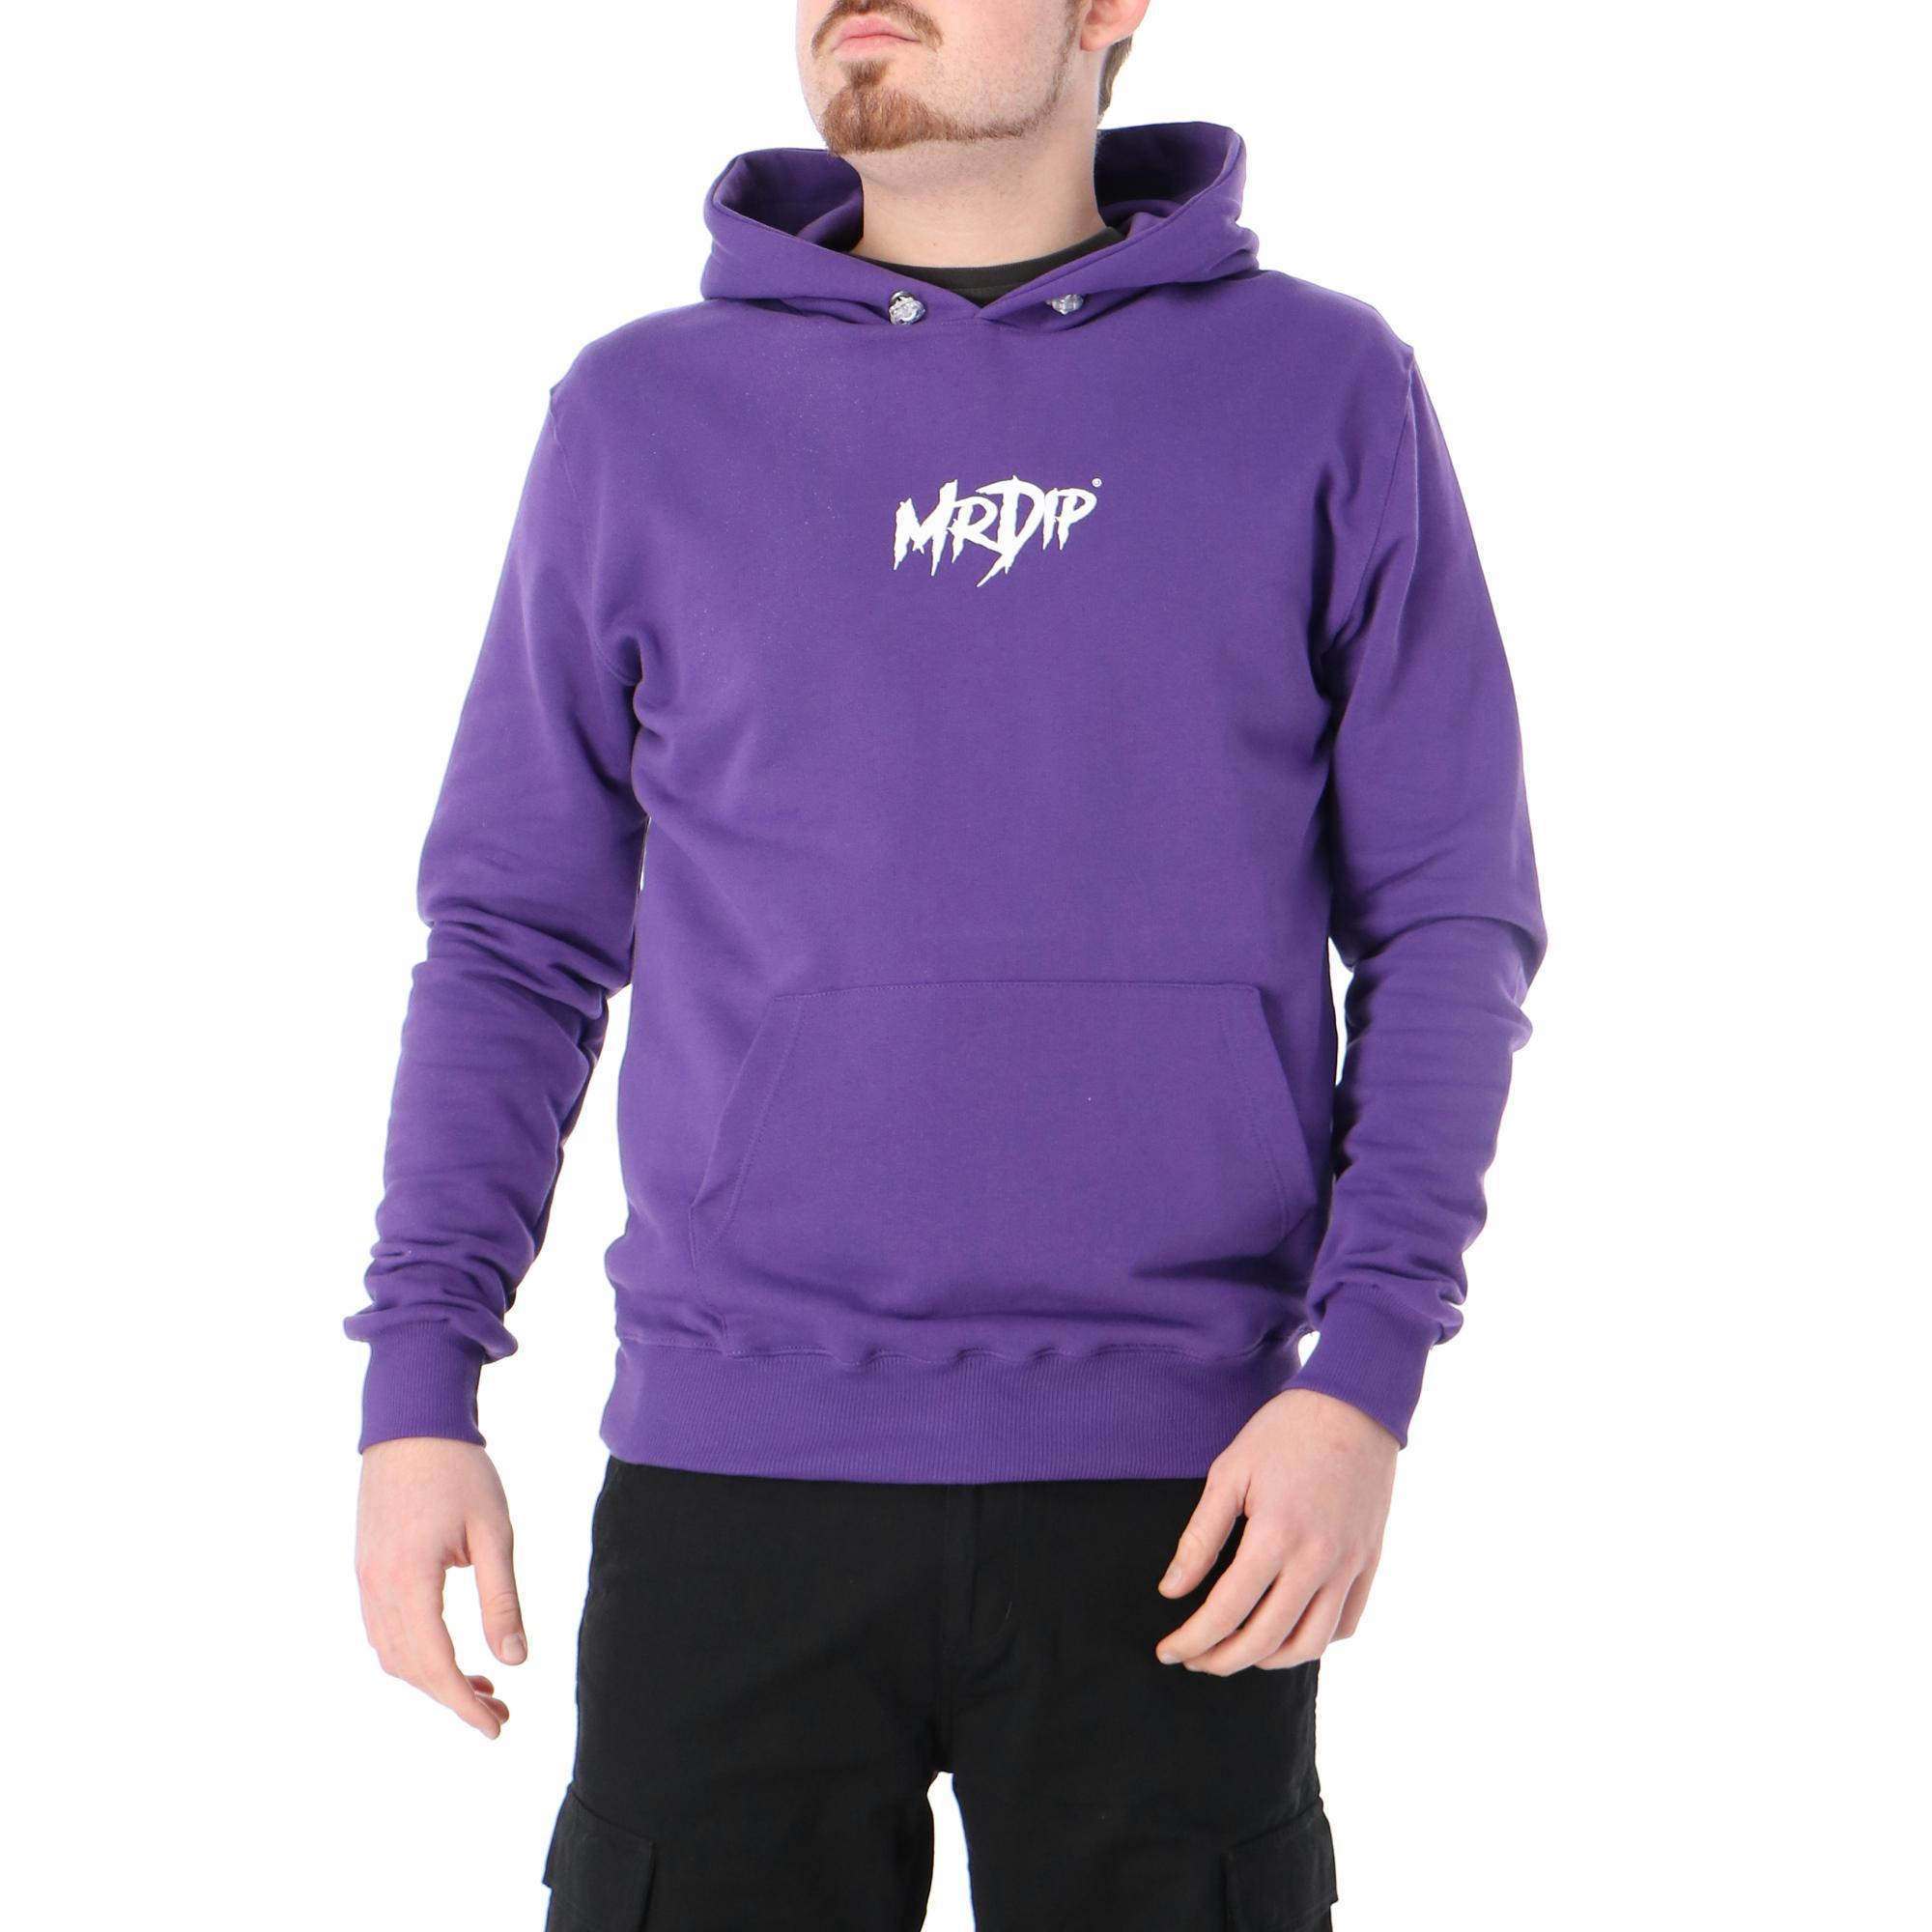 Mrdip Basic Logo Hoodie Purple white